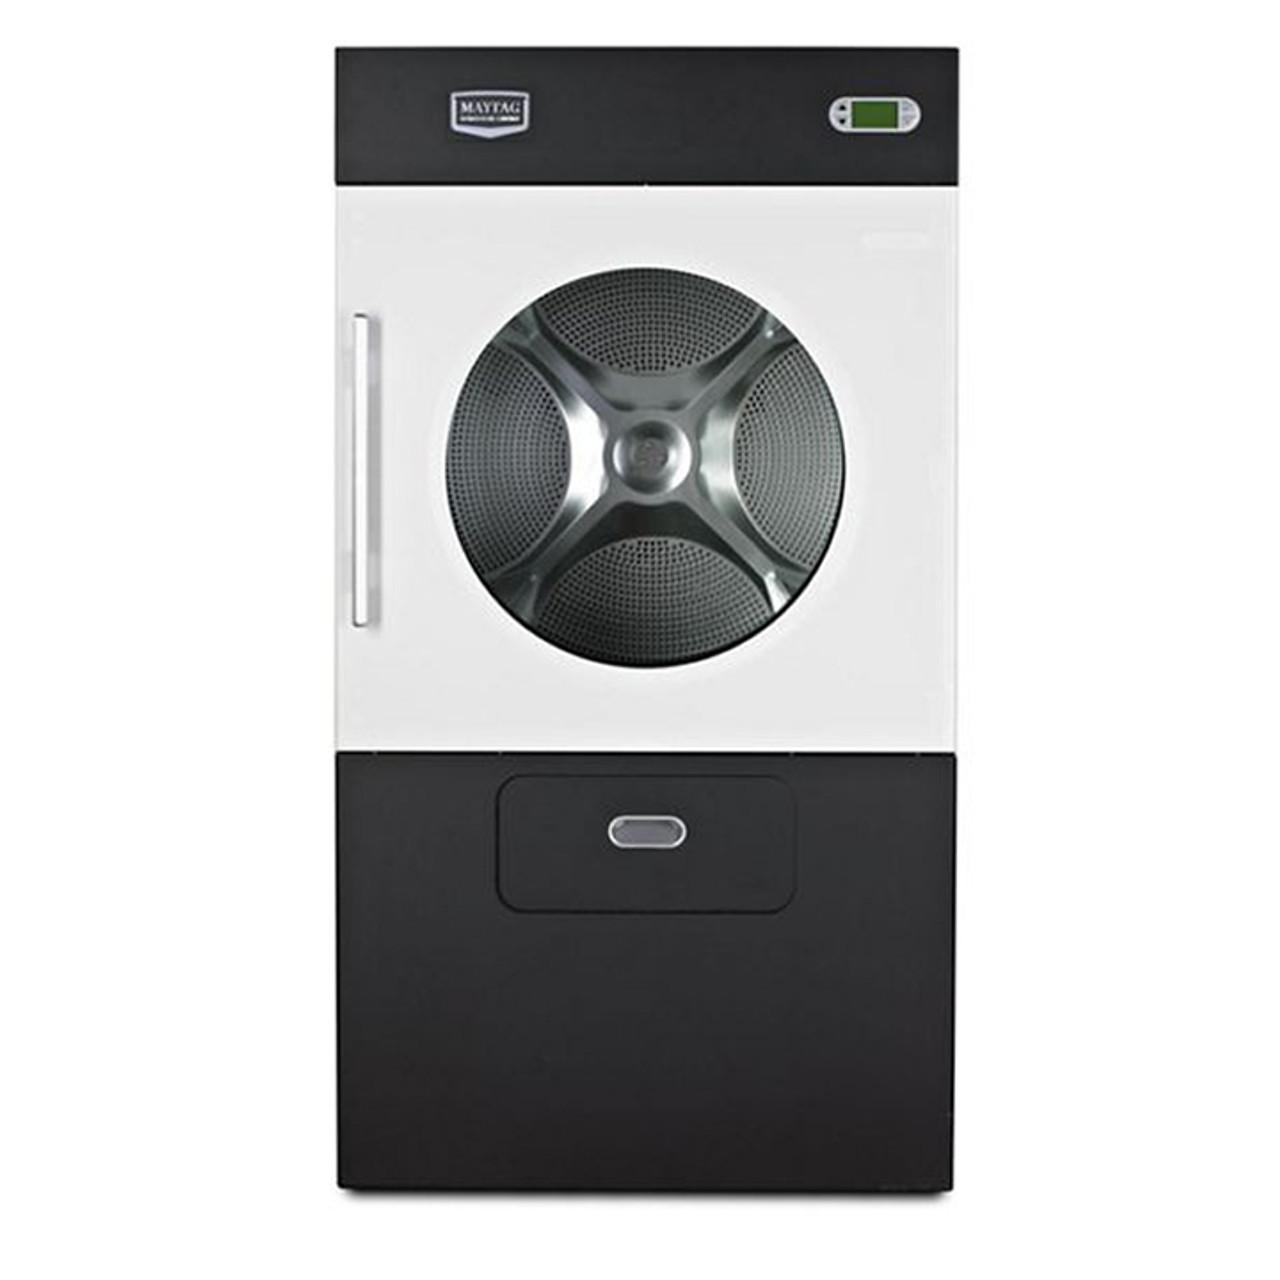 Maytag MDG78PN - Maytag Commercial 75lb OPL Dryer - Energy Advantage Line